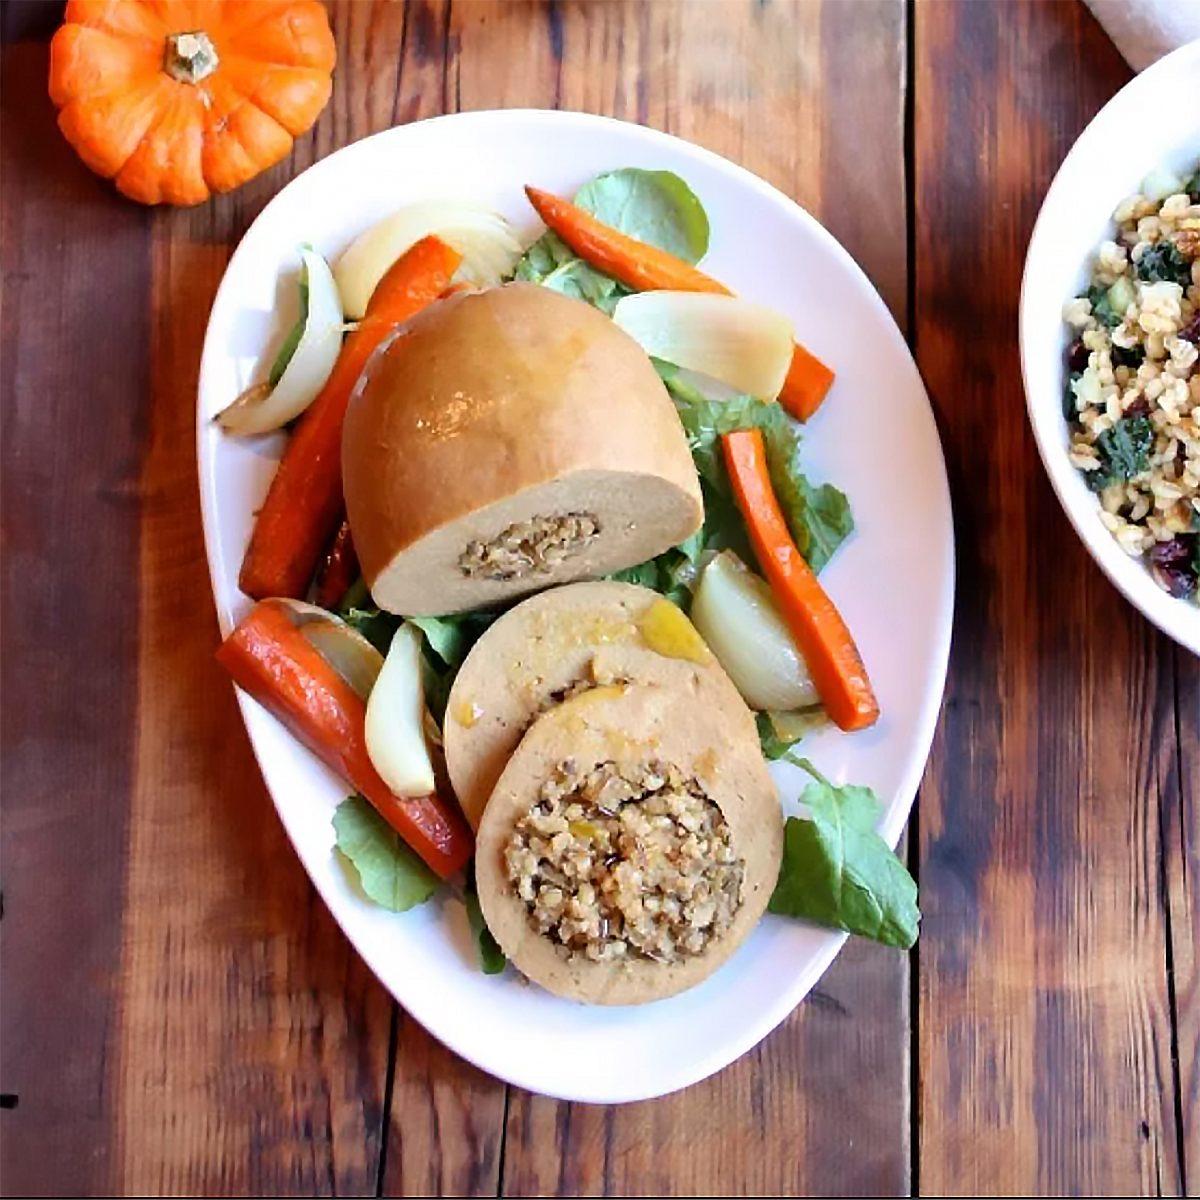 Tofurky Roast for a Vegetarian Thanksgiving dish